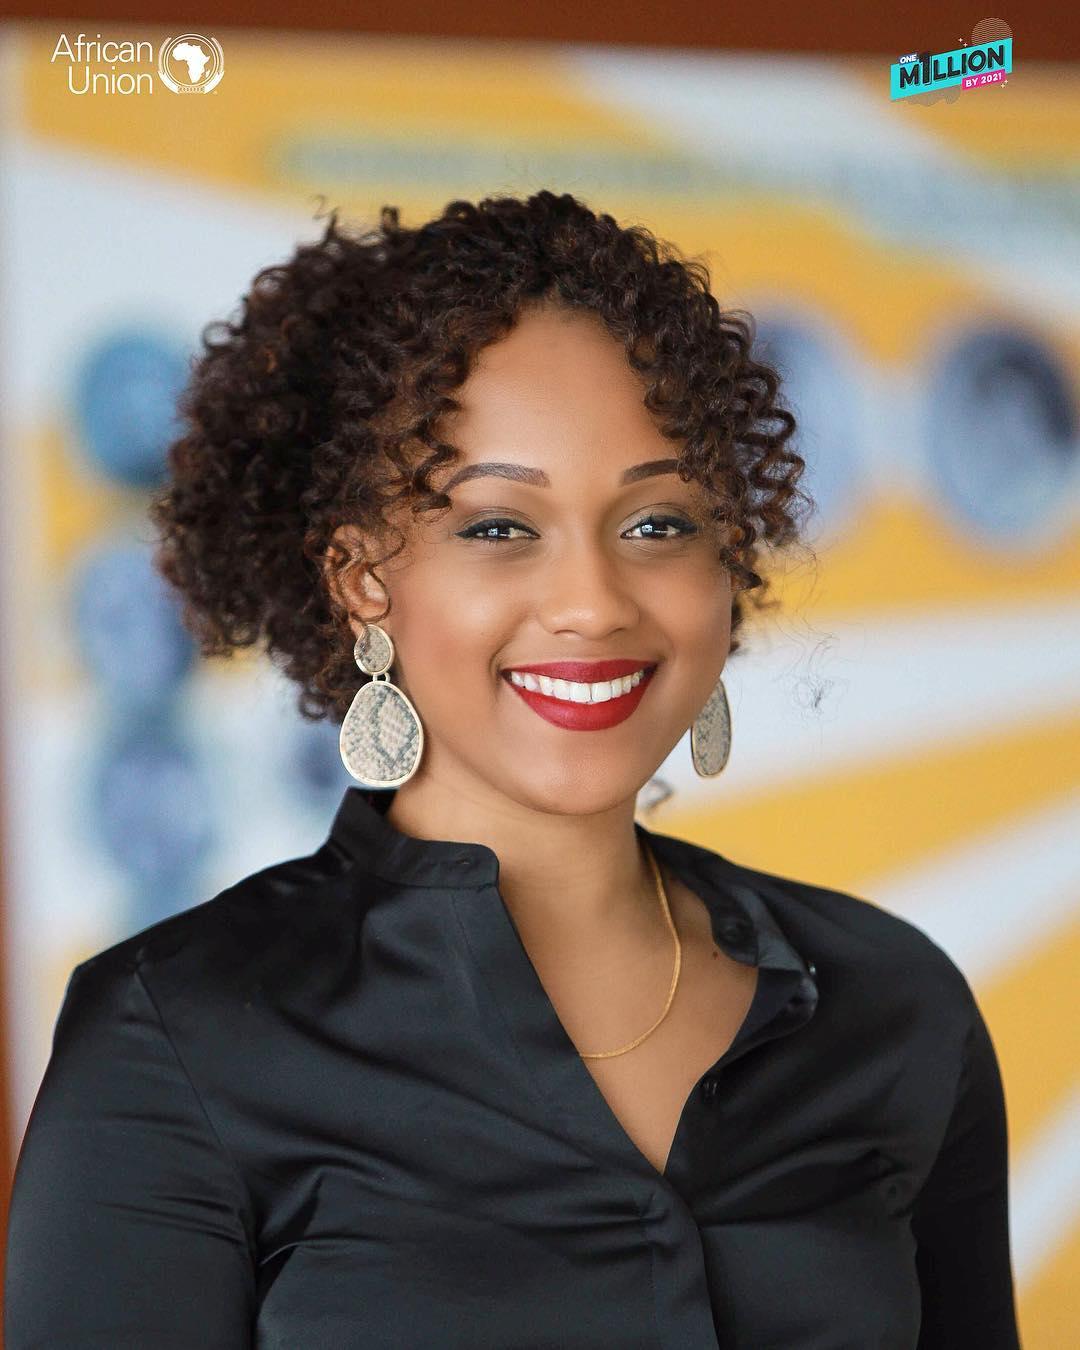 brigitte-alfred-lyimo-most-beautiful-women-africa-2020